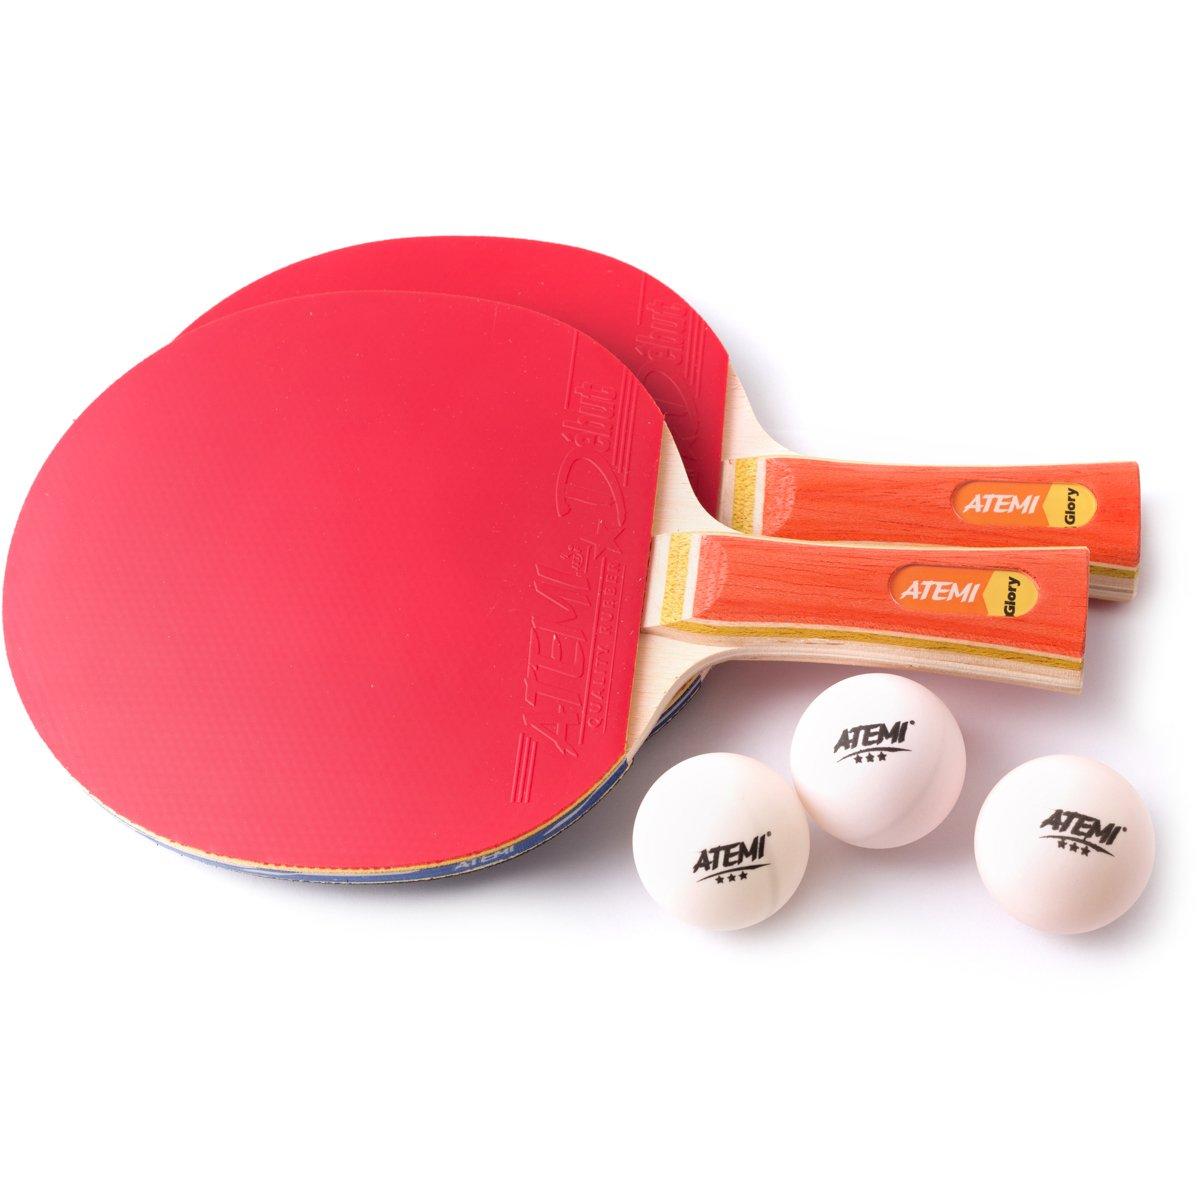 Atemi Sniper 5-Star Table Tennis Bat Bundle  (3-Piece Set ) 5-Ply ... 21c90352fb566